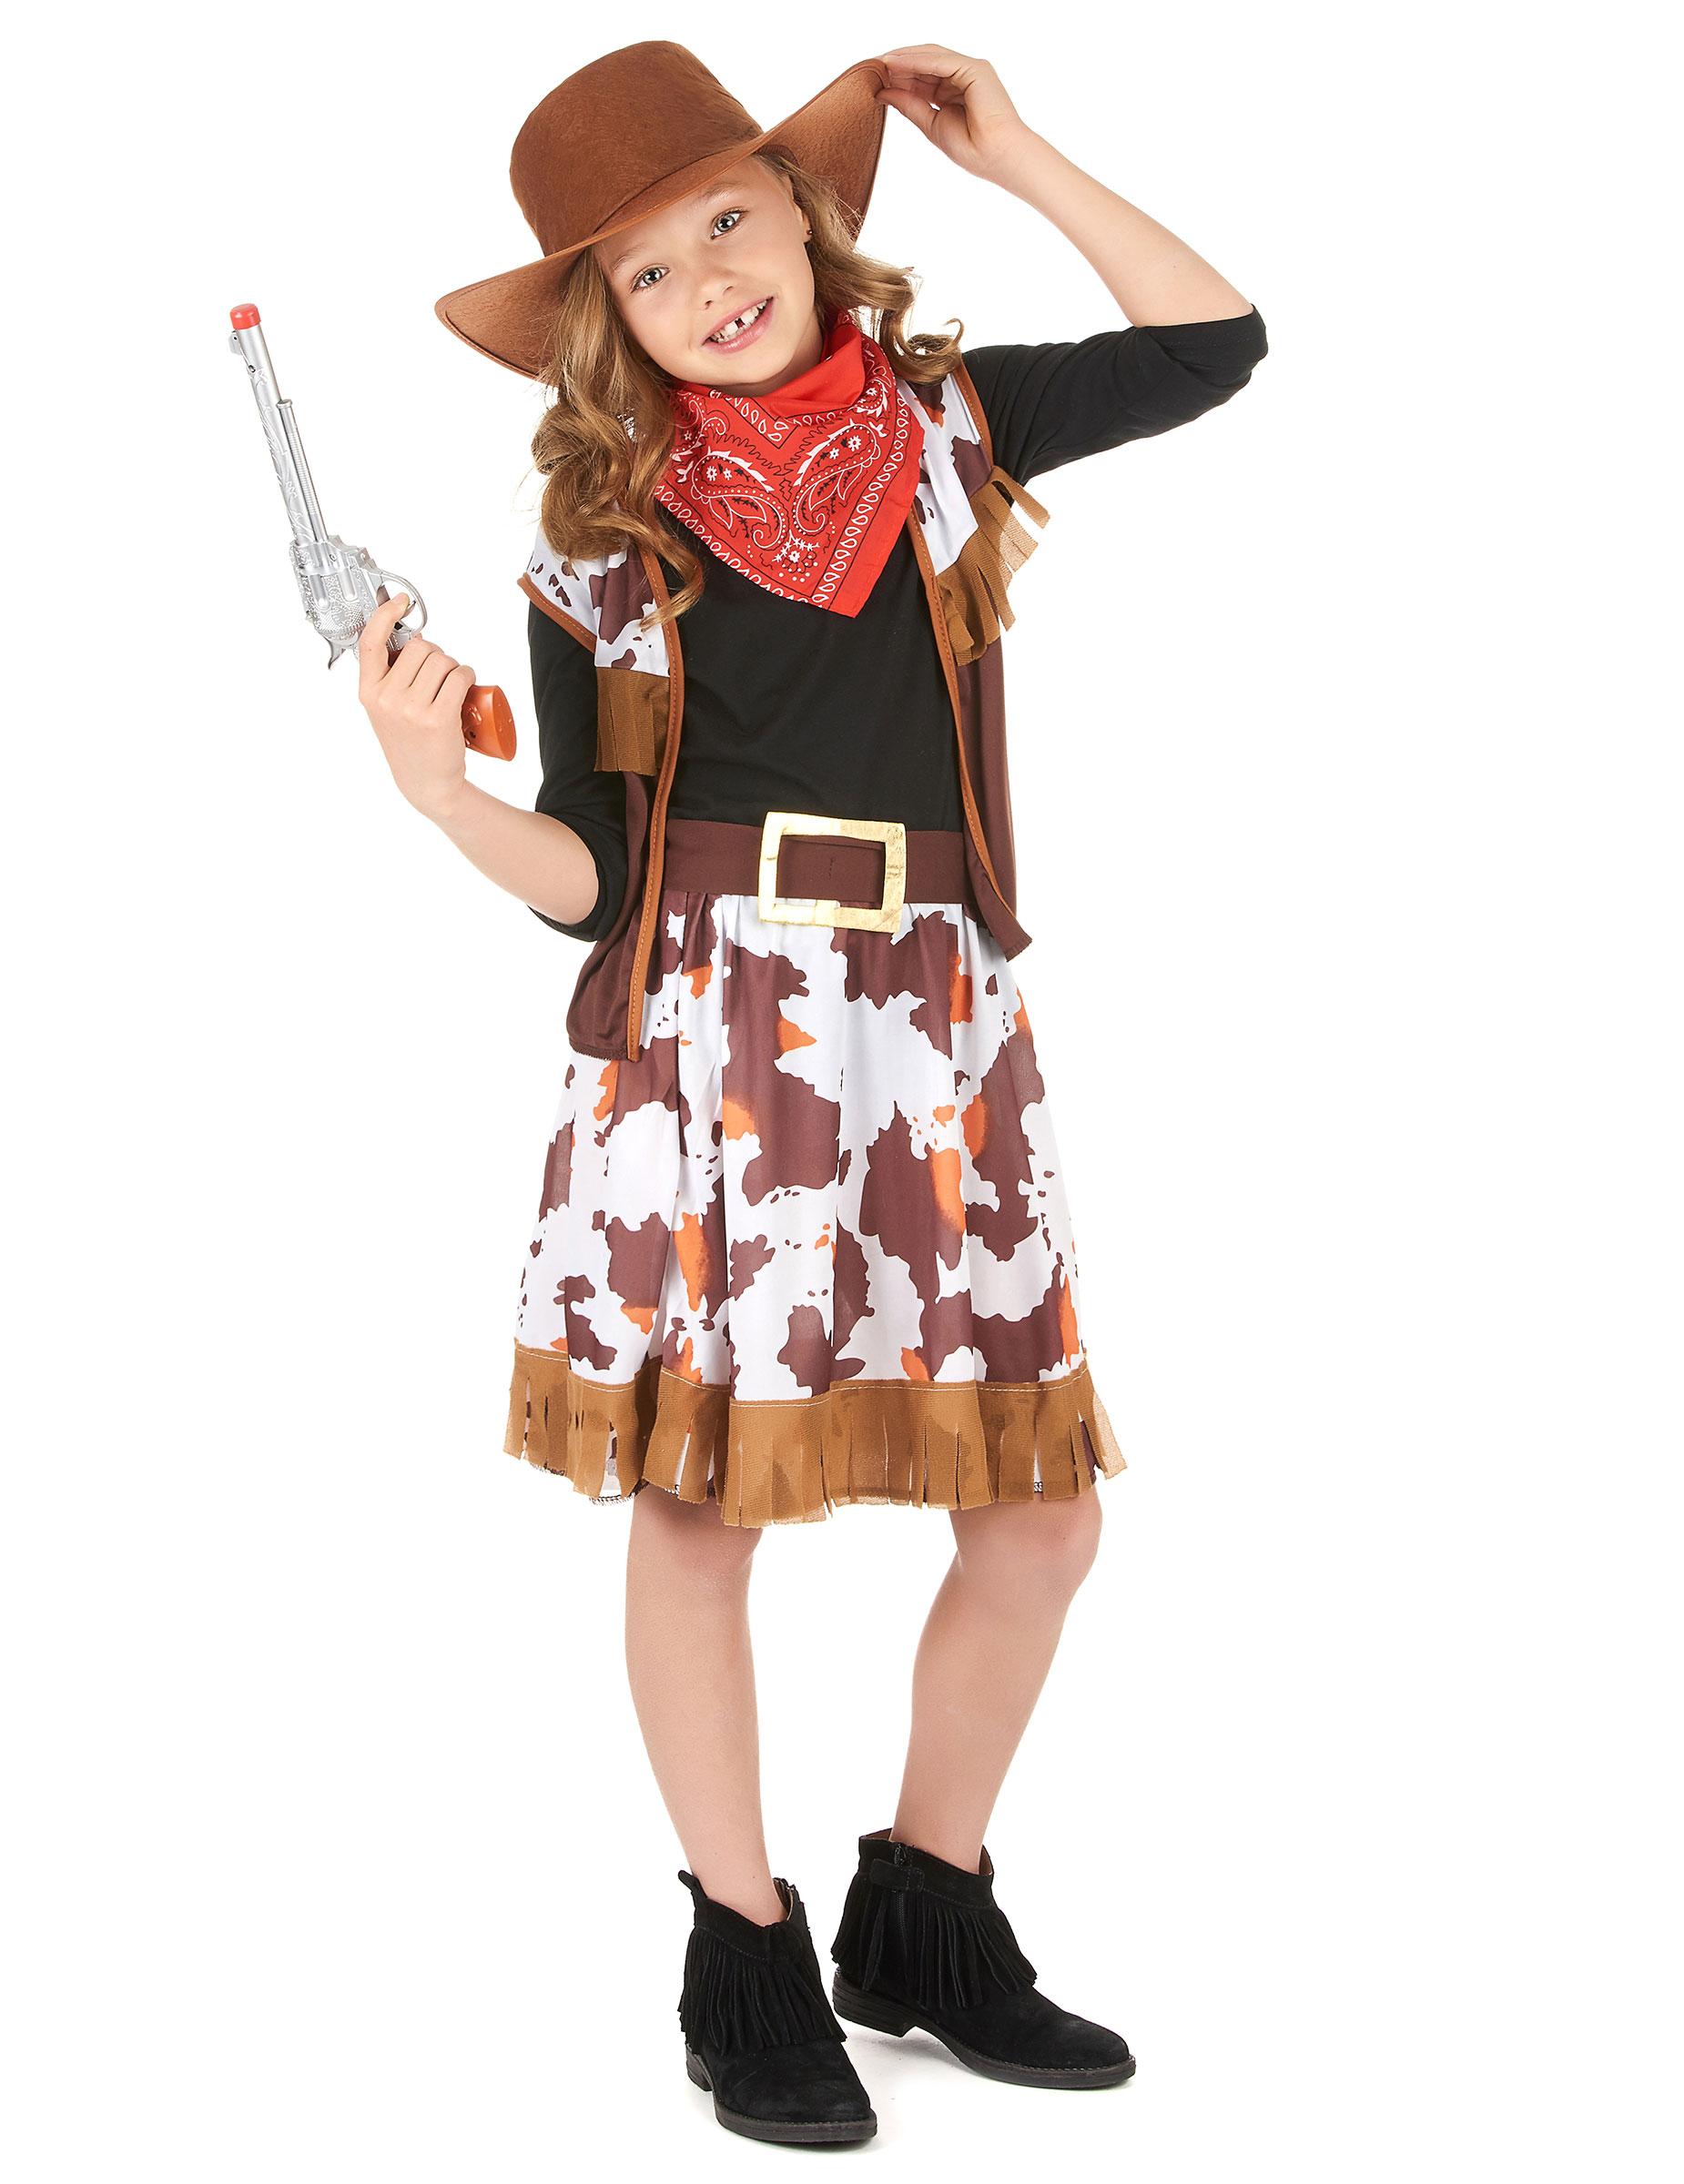 0d2701abcf078 Disfraz vaquera niña  Disfraces niños